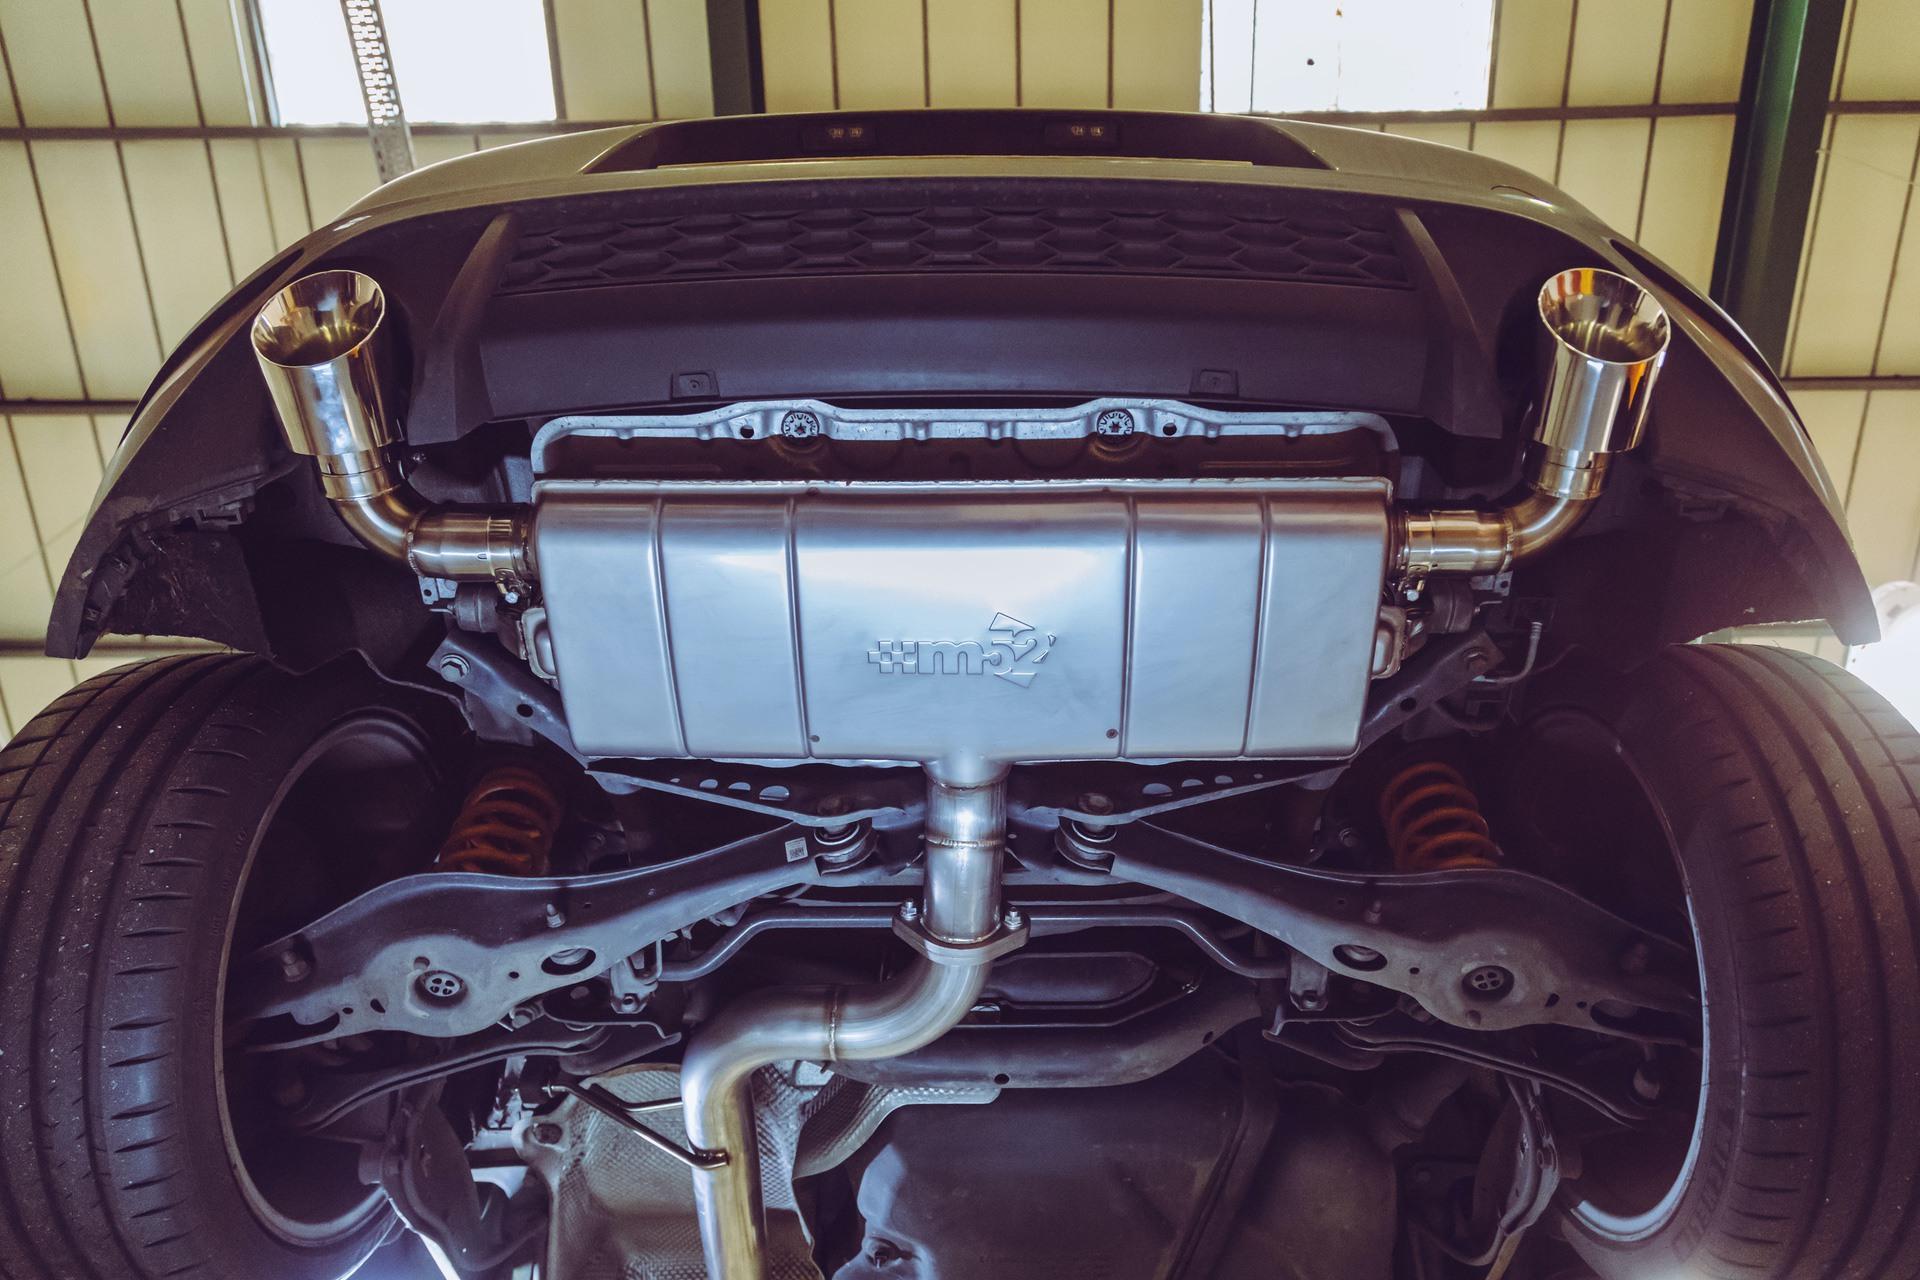 VW_Golf_GTI_Mk7_Mountune_exhaust_0011